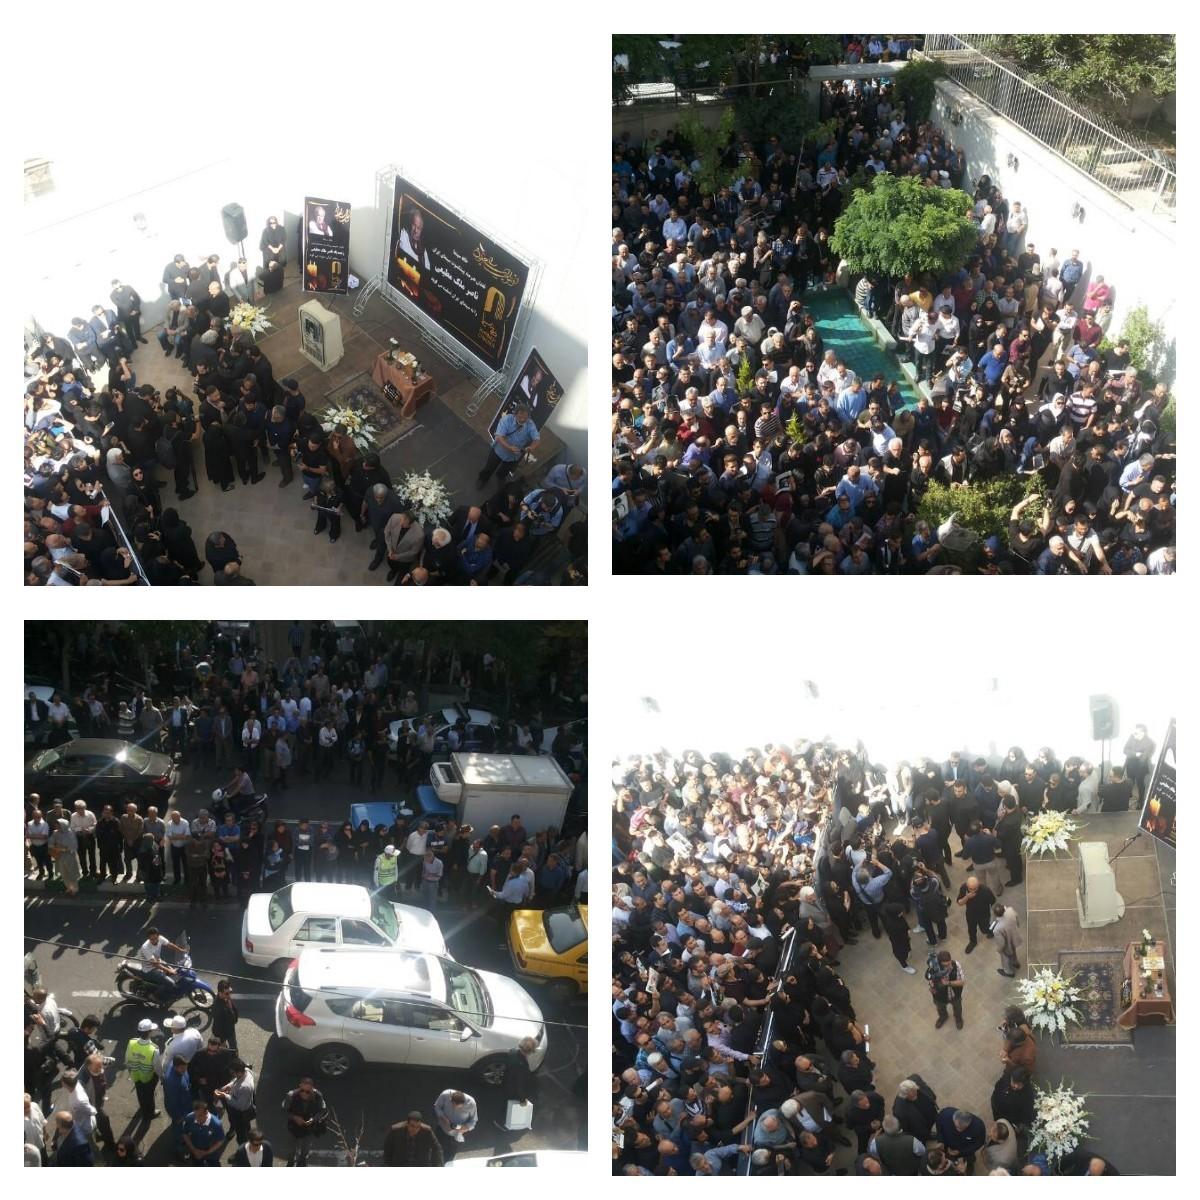 آغاز مراسم تشییع پیکر ناصر ملک مطیعی